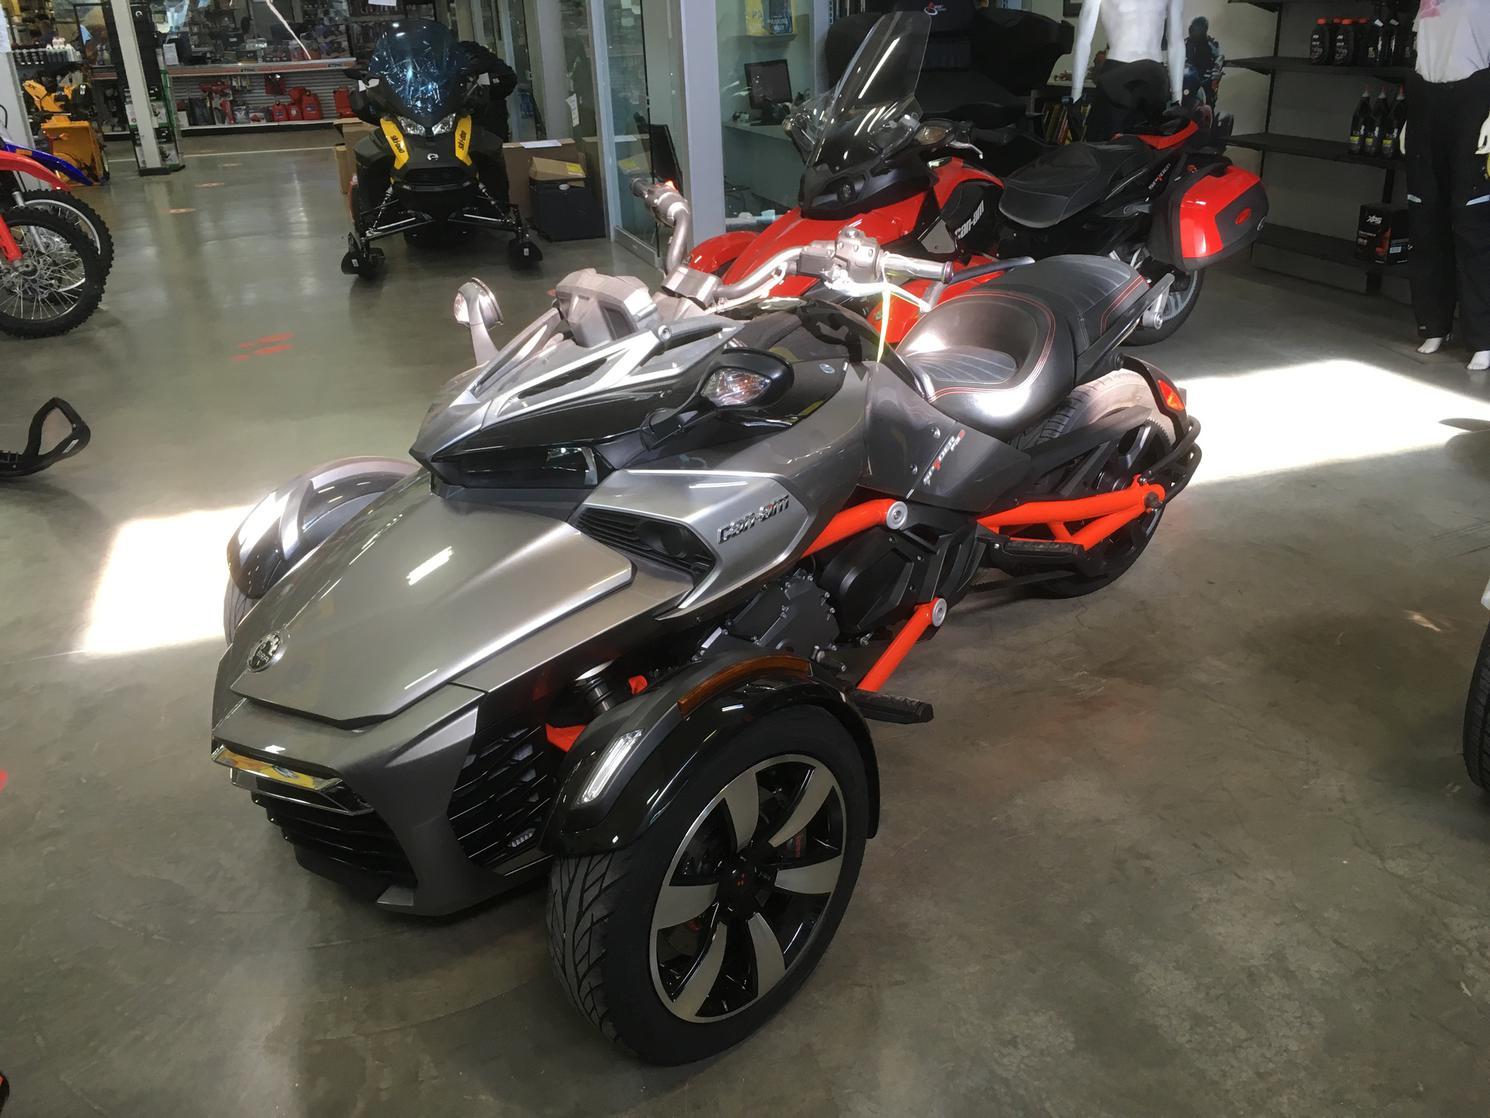 2015 Can-Am SPYDER F3 S SM6